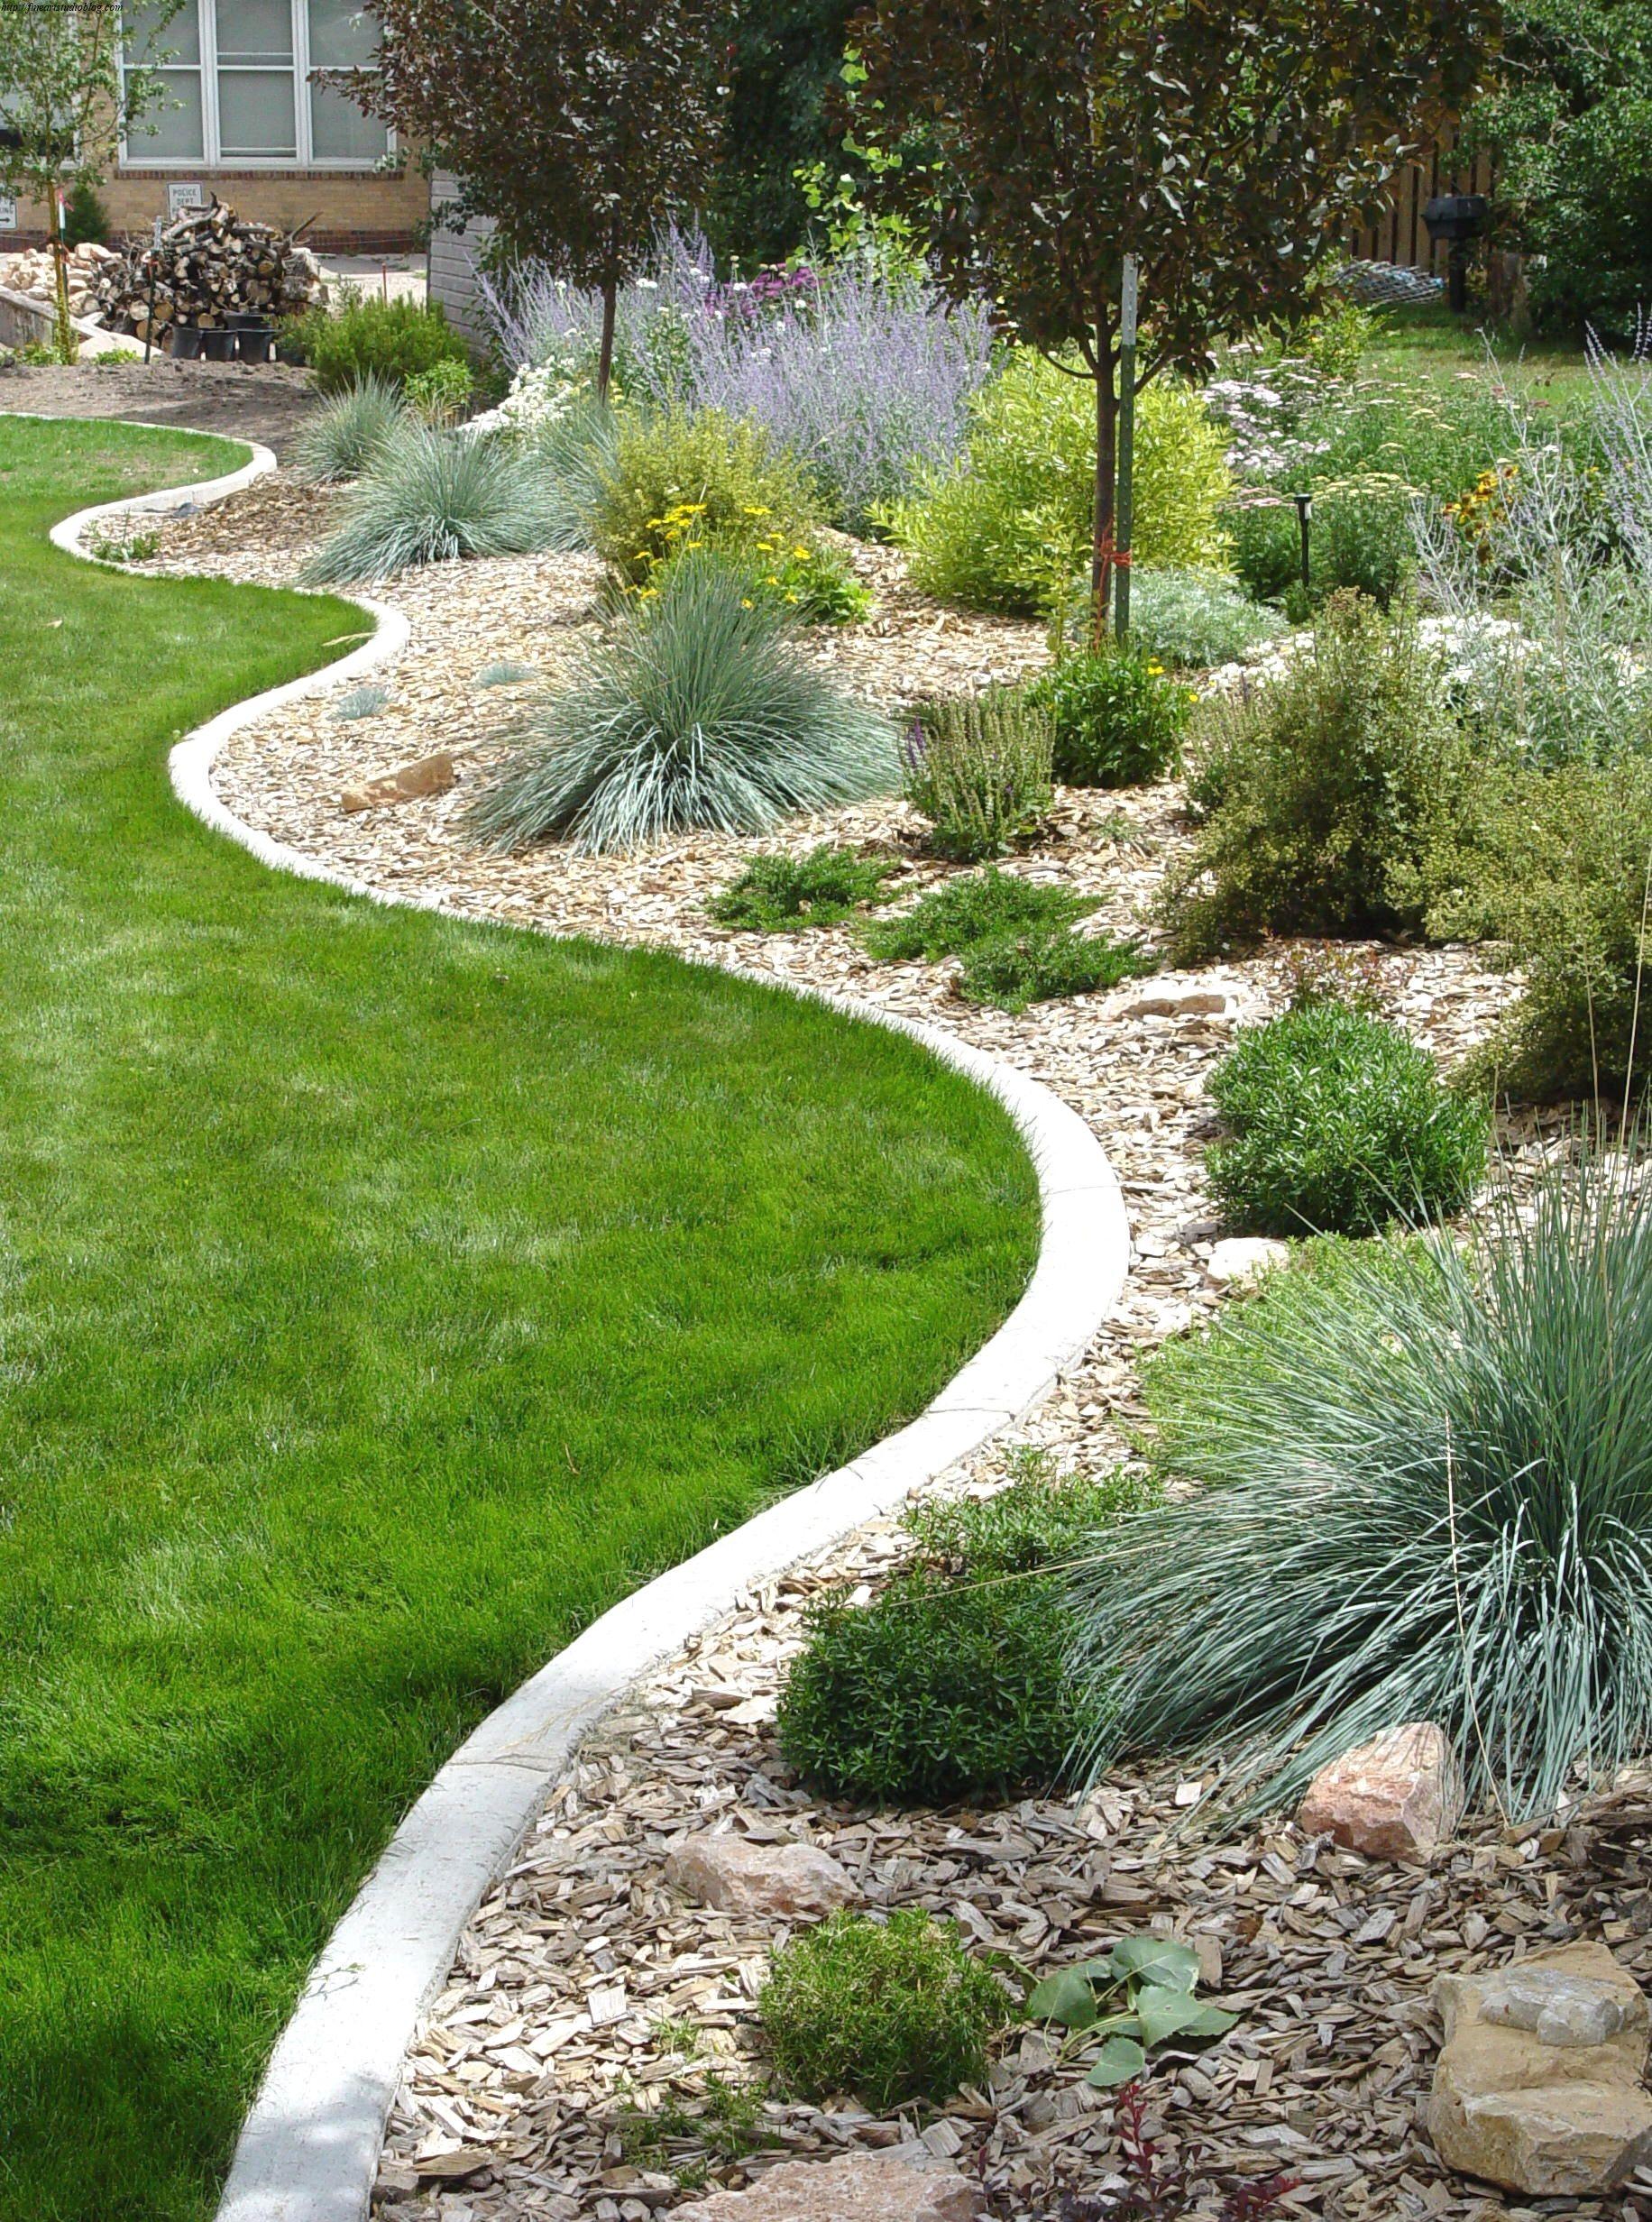 38 Marvelous Metal Landscape Edging Lowes Composition Garden Edging Landscape Edging Backyard Landscaping Designs